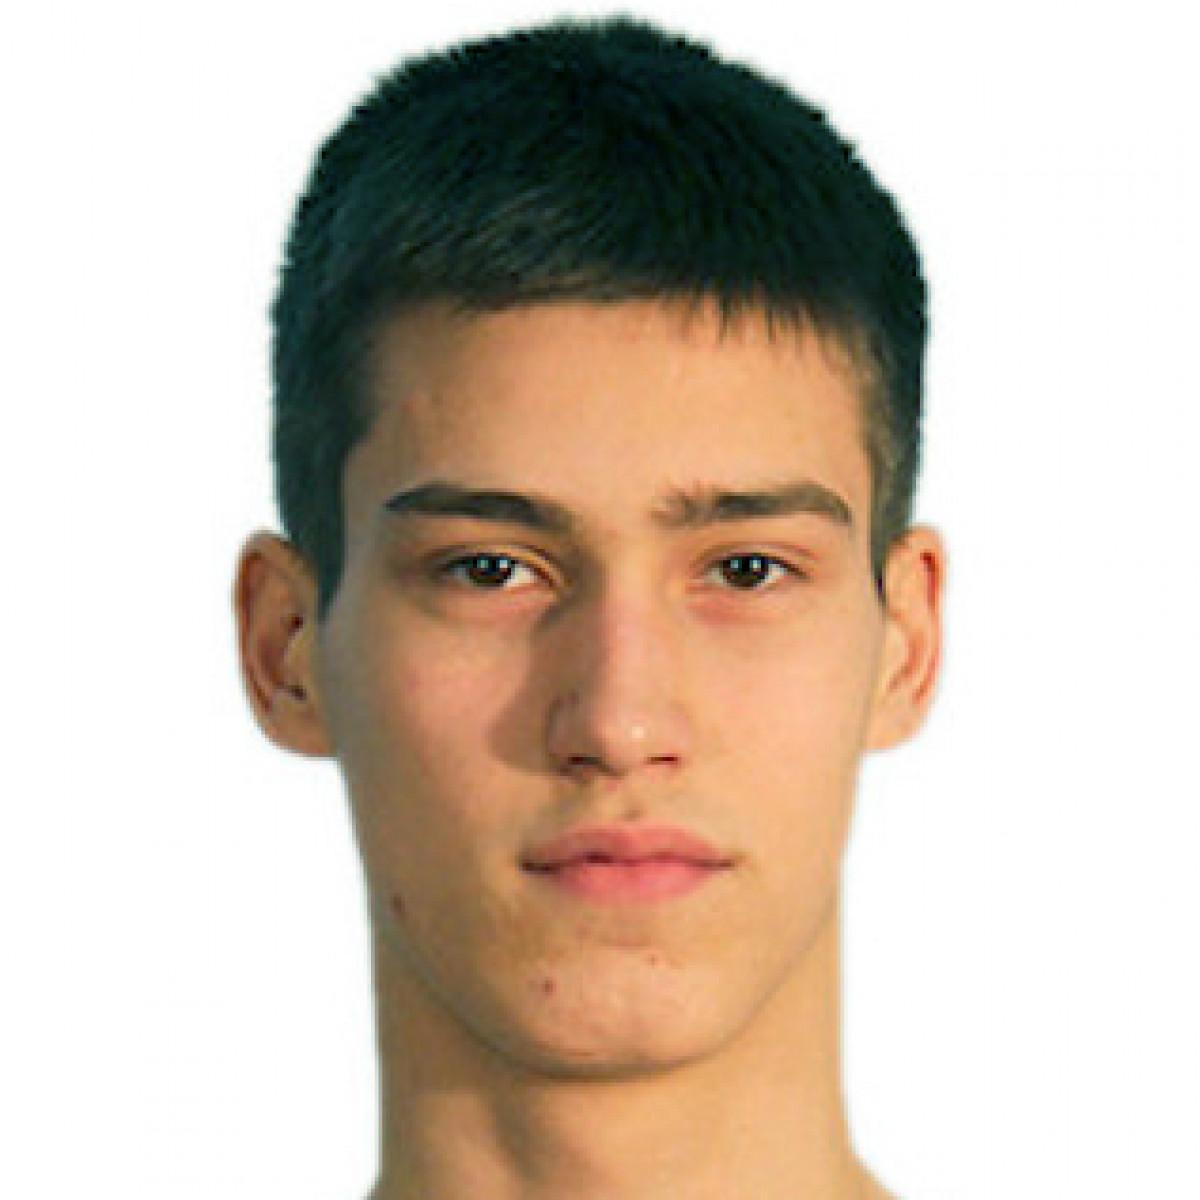 Marko Vucic